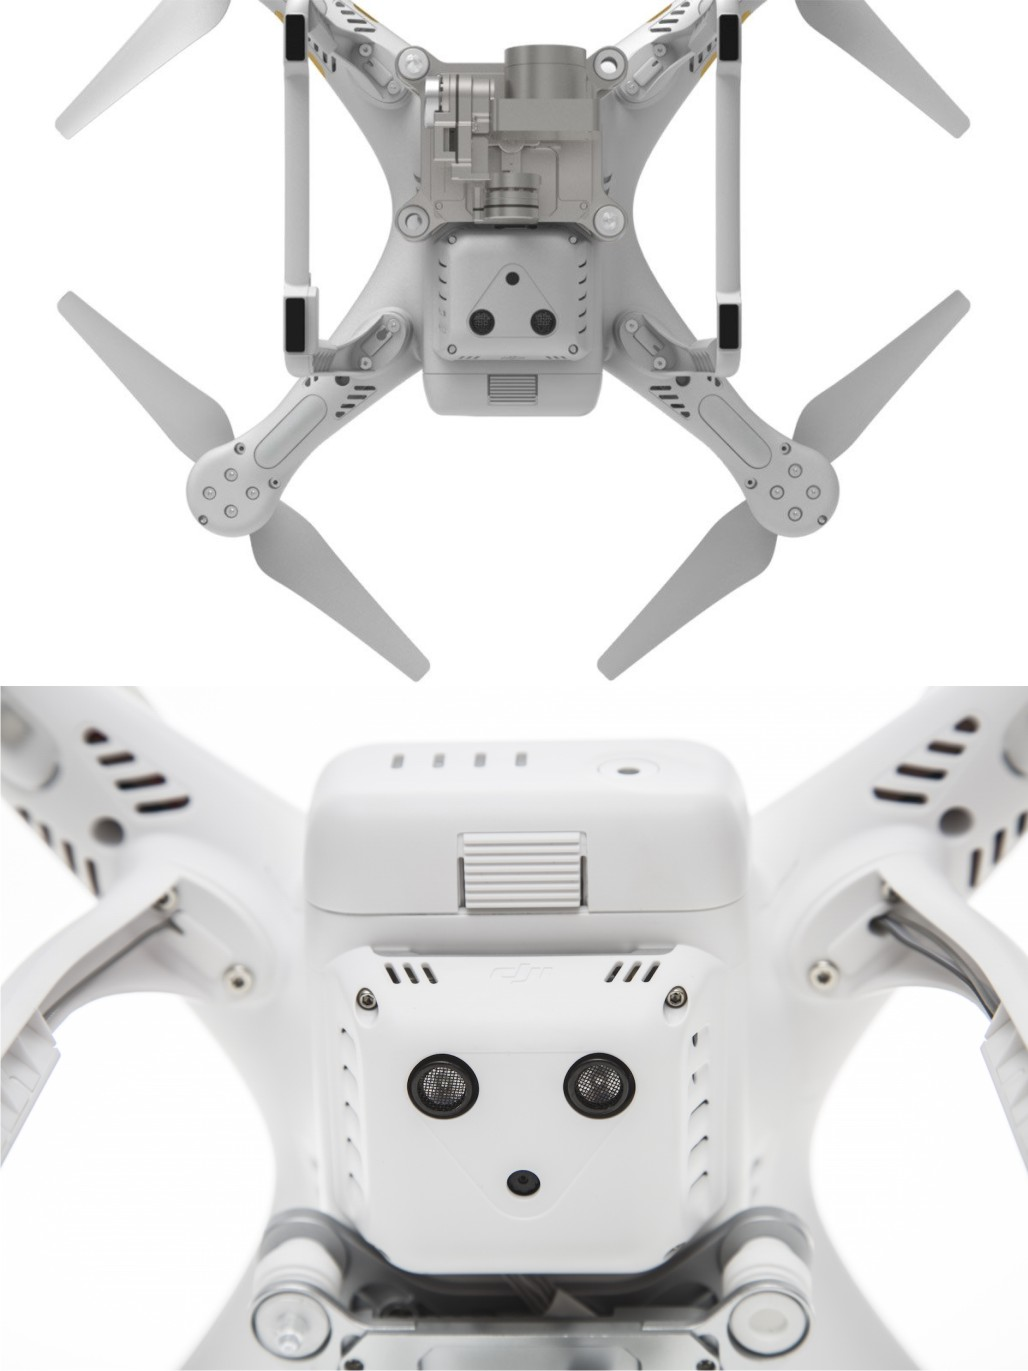 Perbedaan Dji Phantom 3 Standard Professional Dan Advanced Omah Drones Intelligent Flight Battery Batere Original Omahdrones